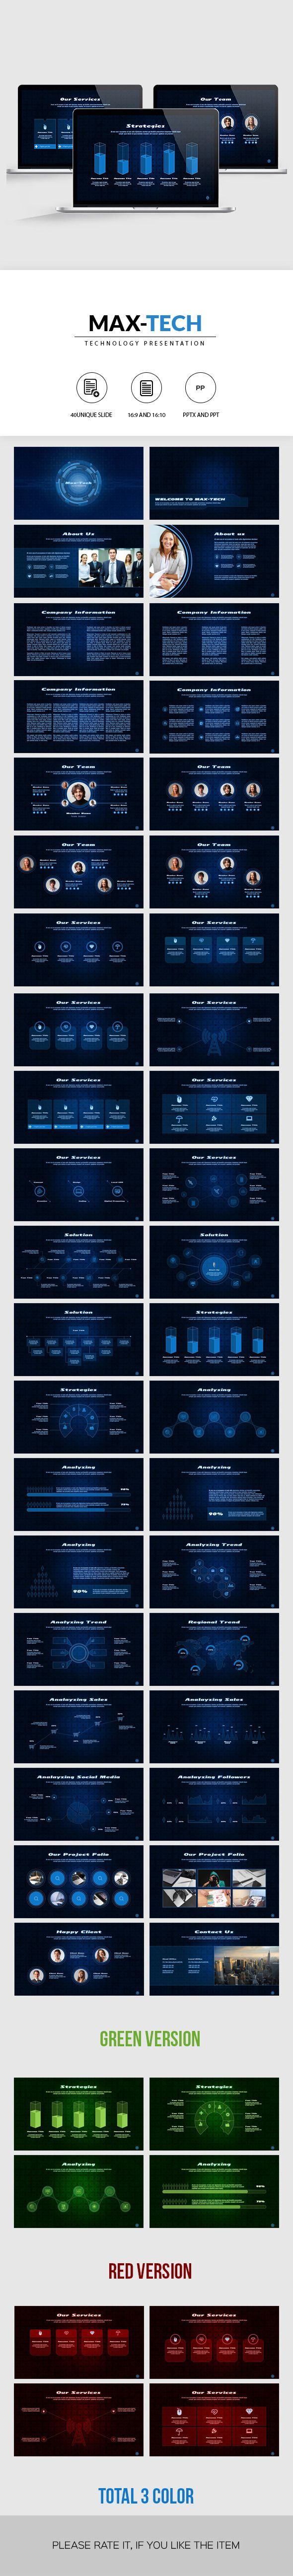 Max-Tech | Technology PowerPoint Presentation - Business PowerPoint Templates